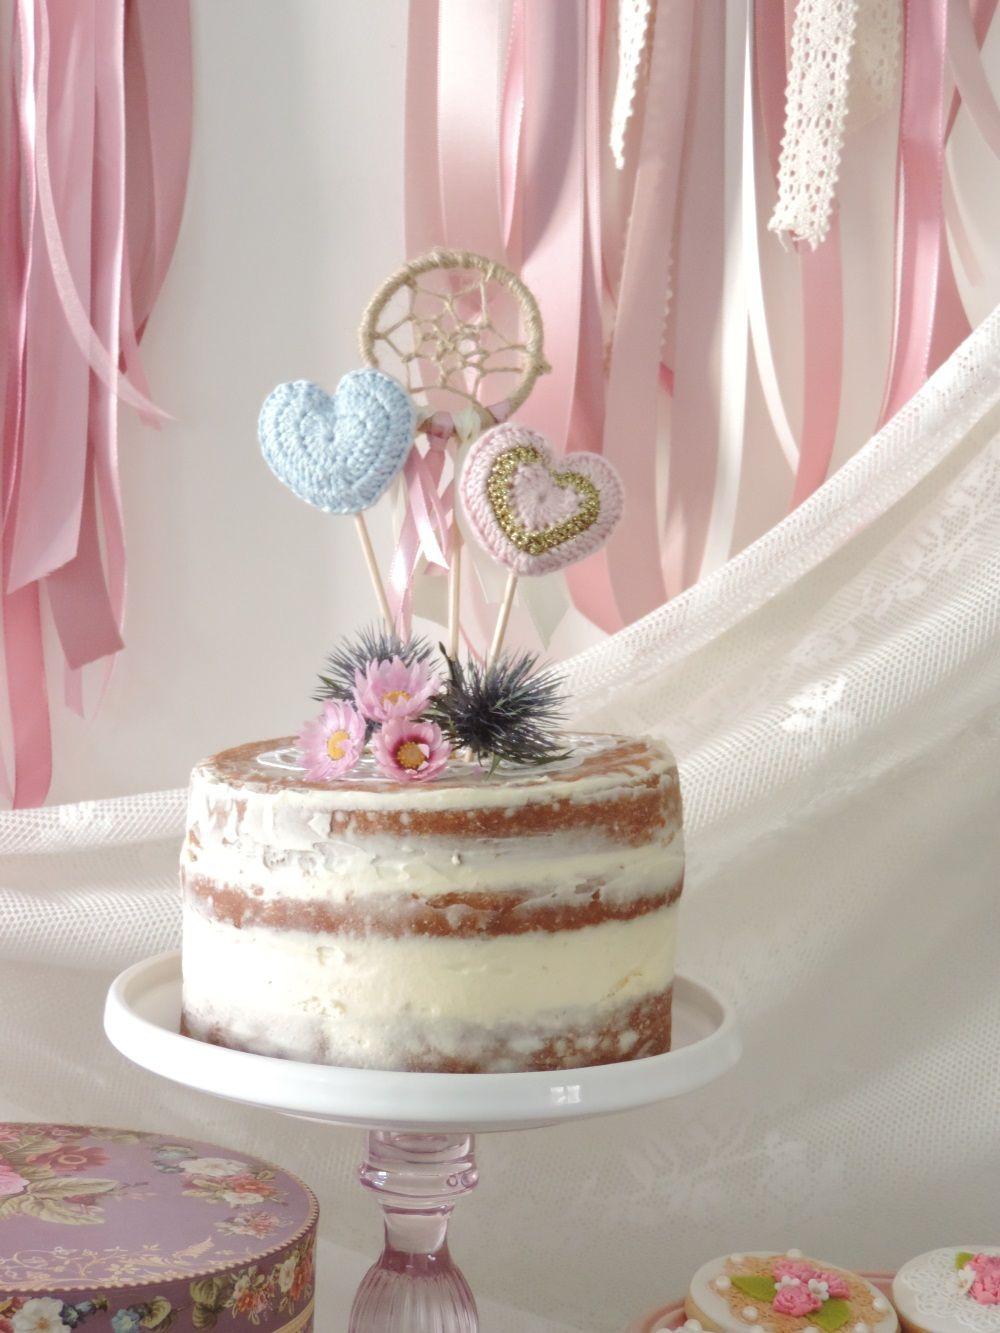 Épinglé par Bénédicte NAVARRO sur Birthday Cakes